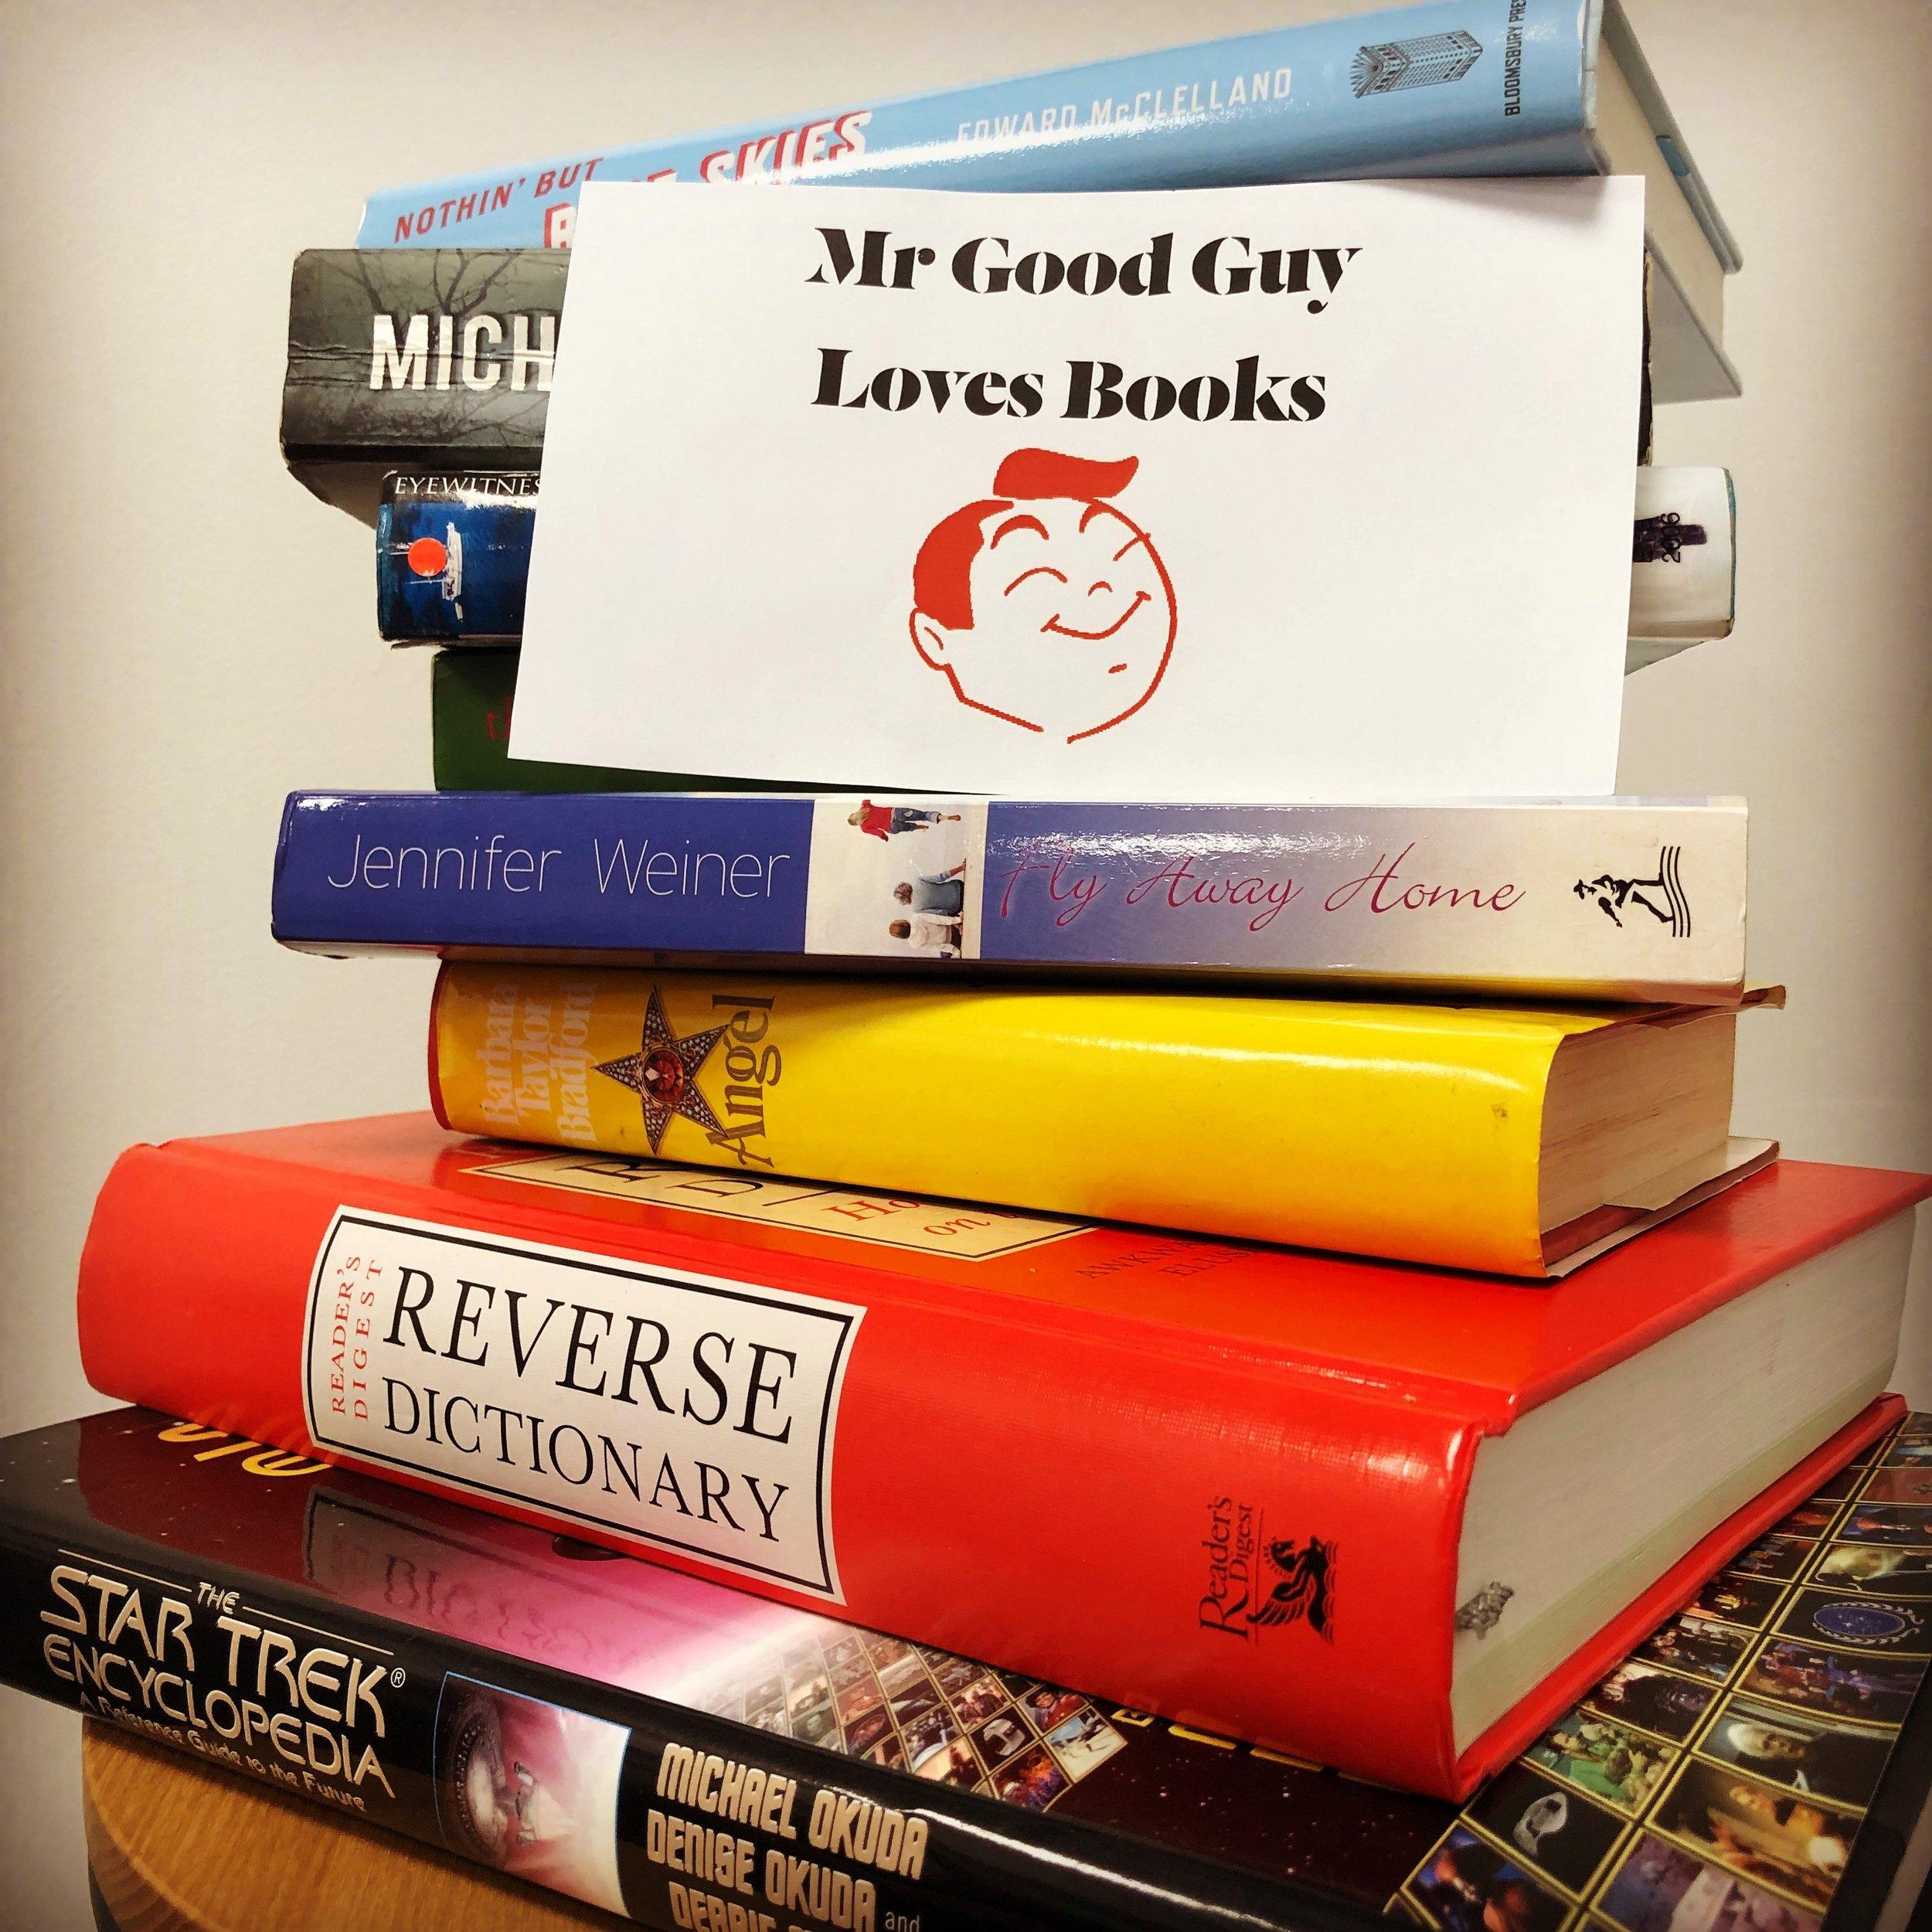 Mr Good Guy Hobart Restaurant- Book Exchange